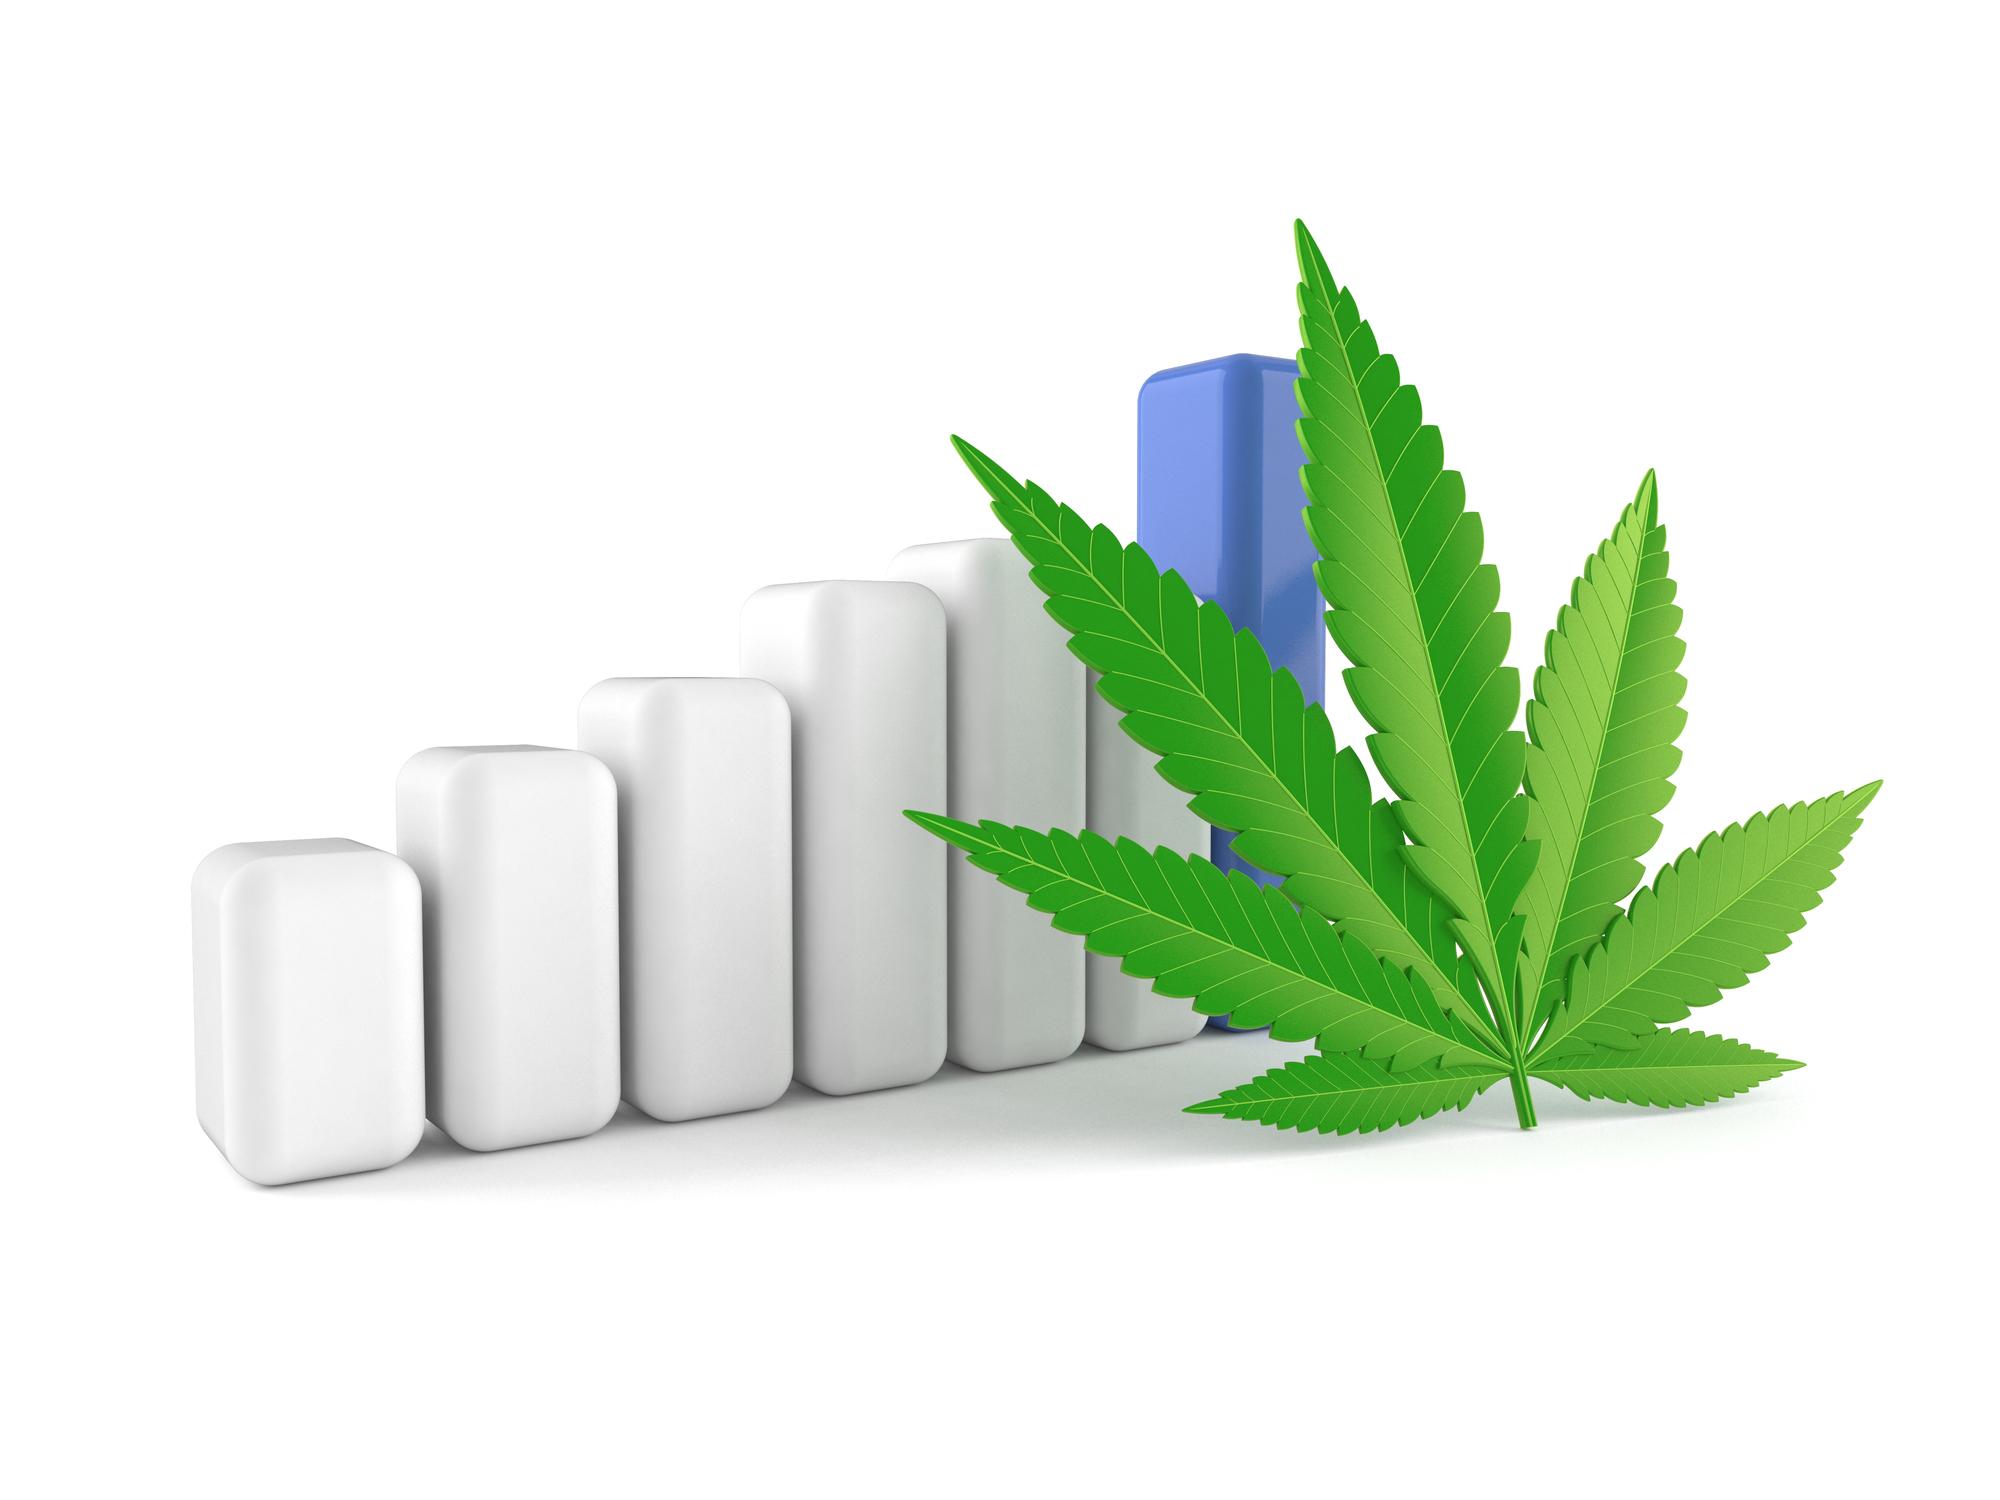 Marijuana leaf next to rising bar chart